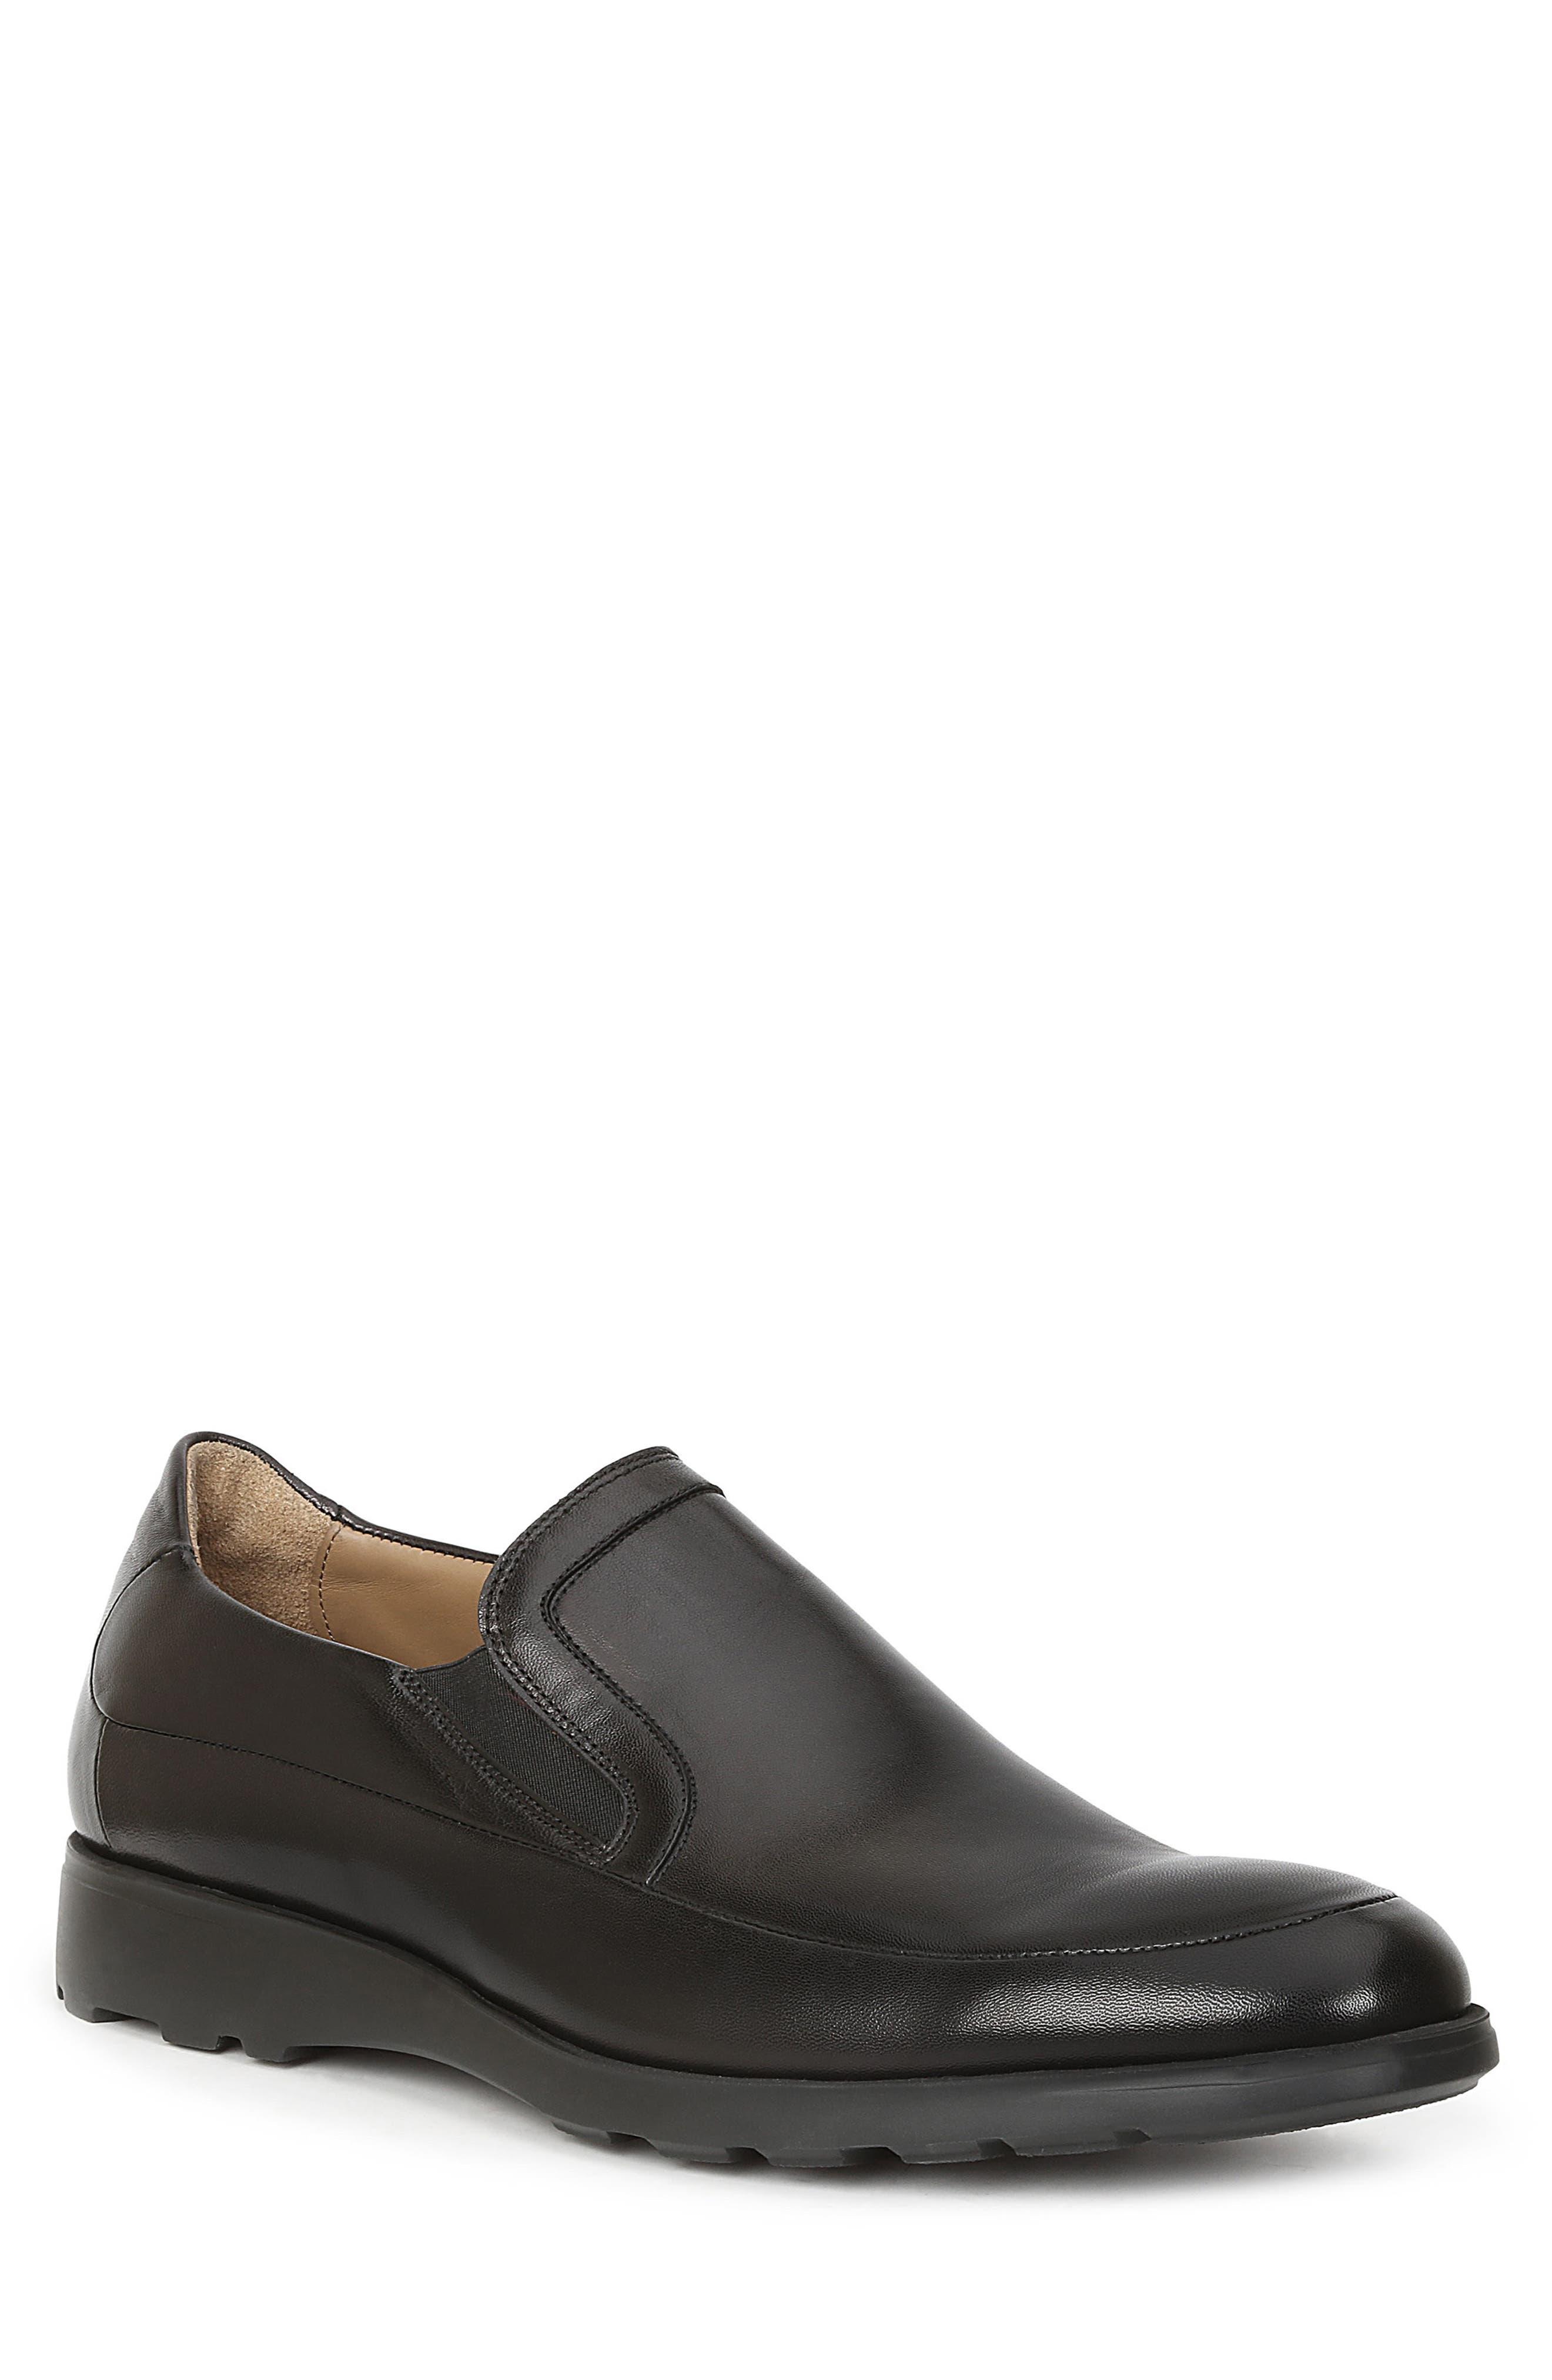 Vegas Apron Toe Loafer,                         Main,                         color, Black Leather